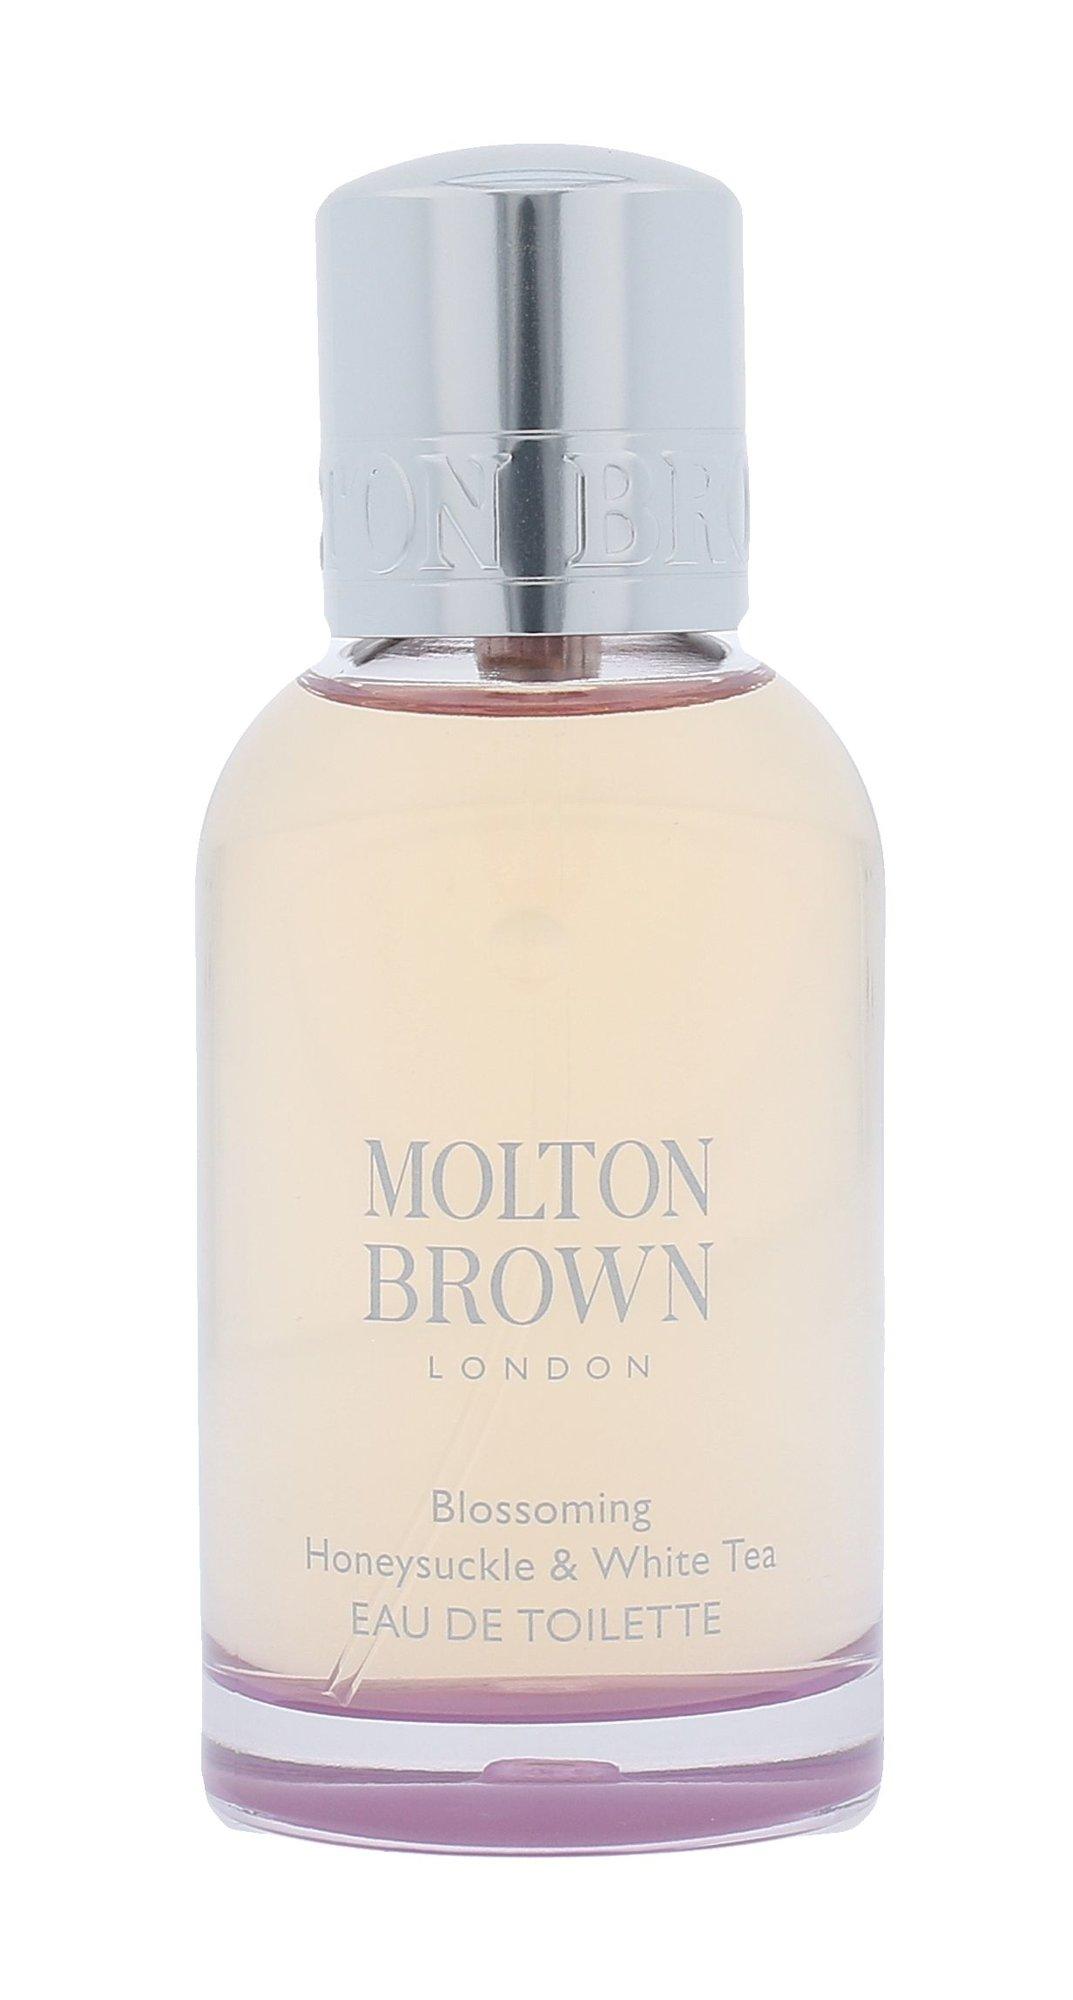 Molton Brown Blossoming Honeysuckle & White Tea EDT 50ml